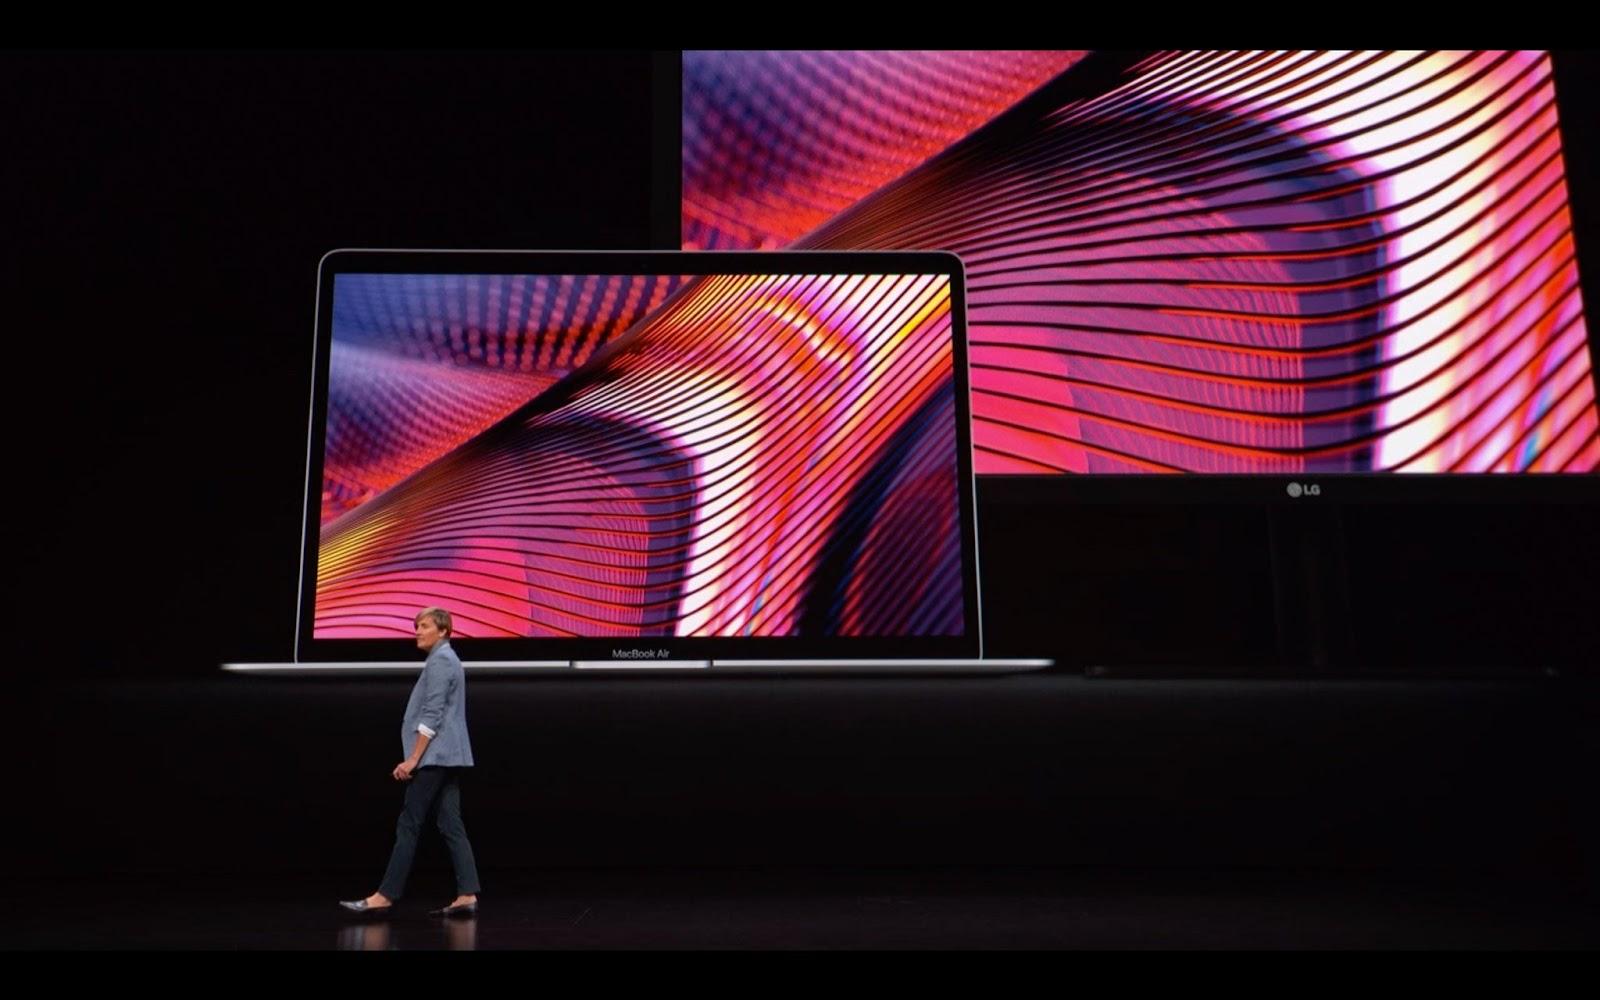 Đang tải Macbook_Air_2018_tinhte-16.jpg…